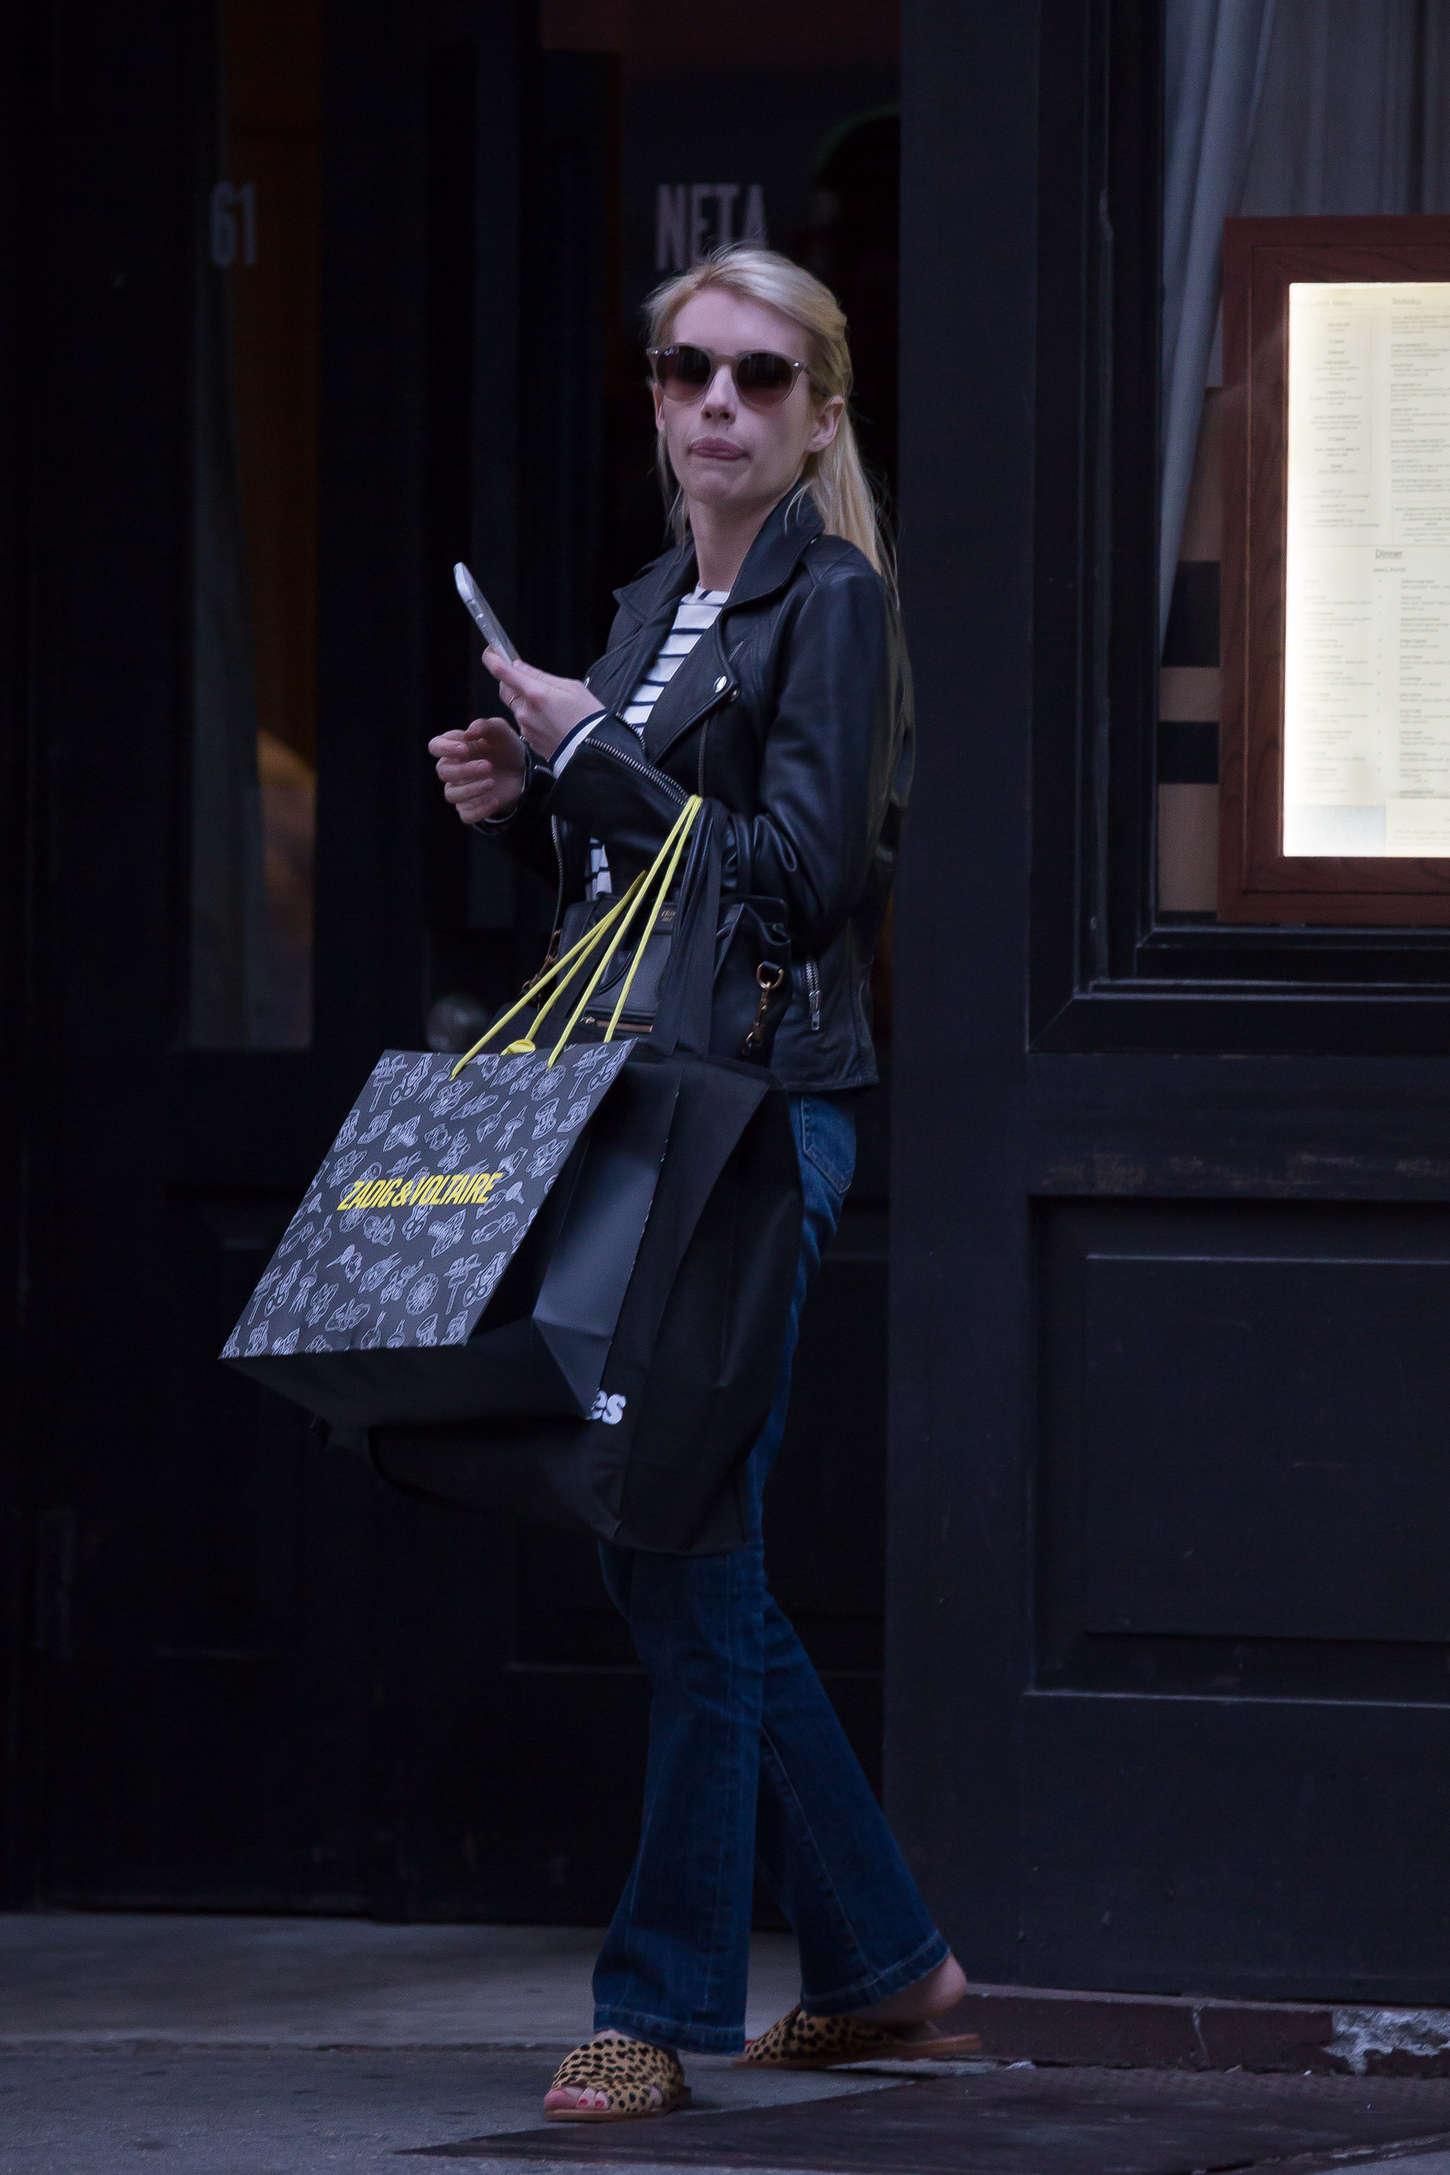 Emma Roberts 2015 : Emma Roberts in Jeans -03